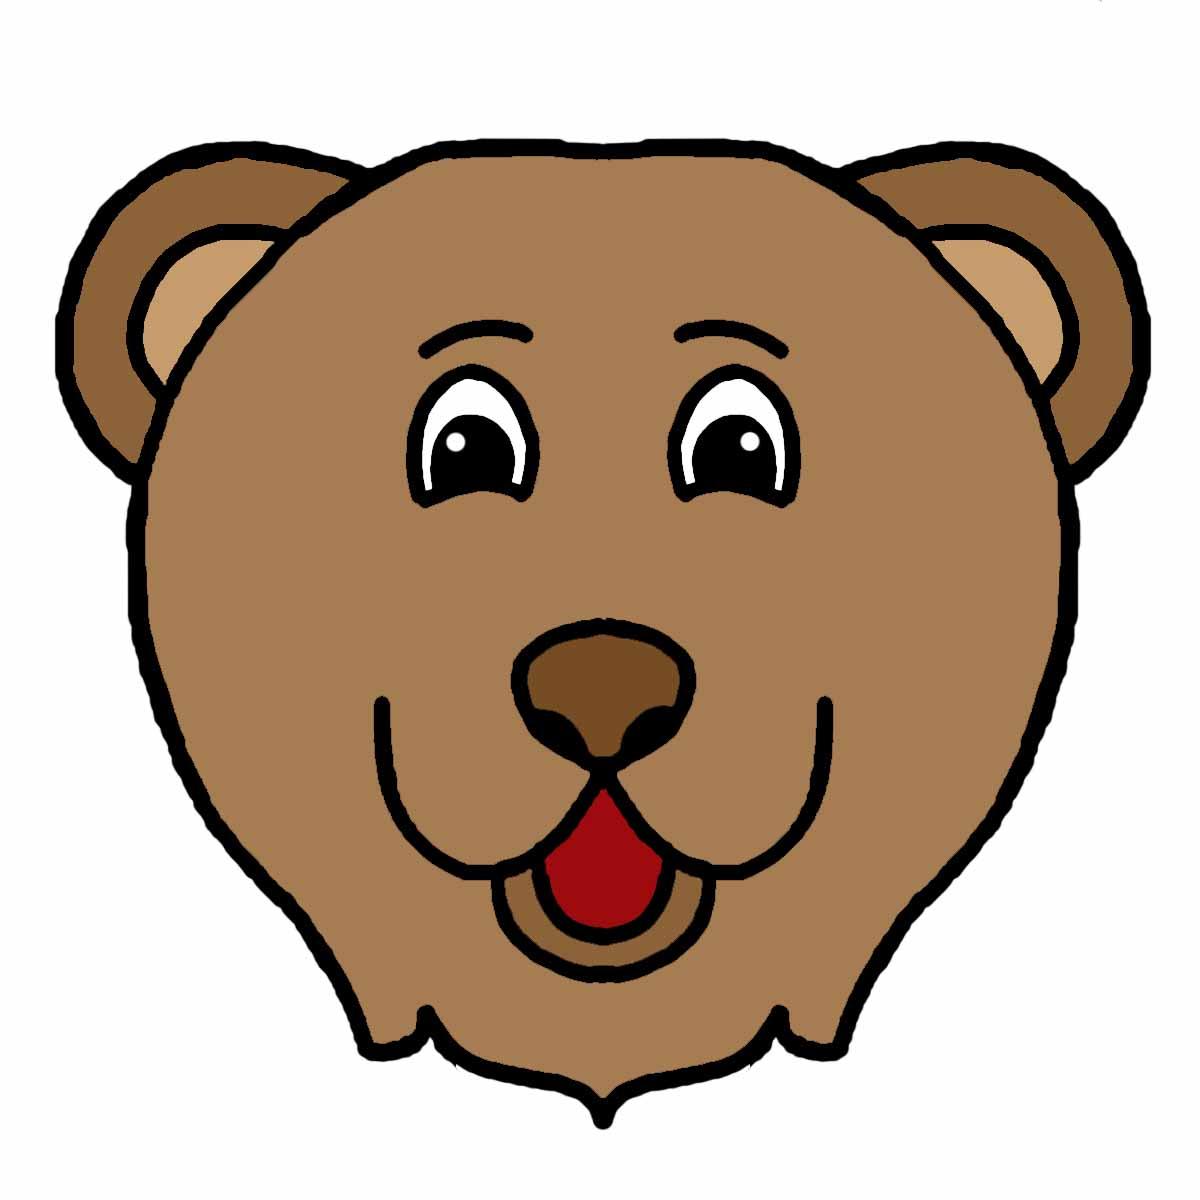 1200x1200 Image Of Bear Head Clipart